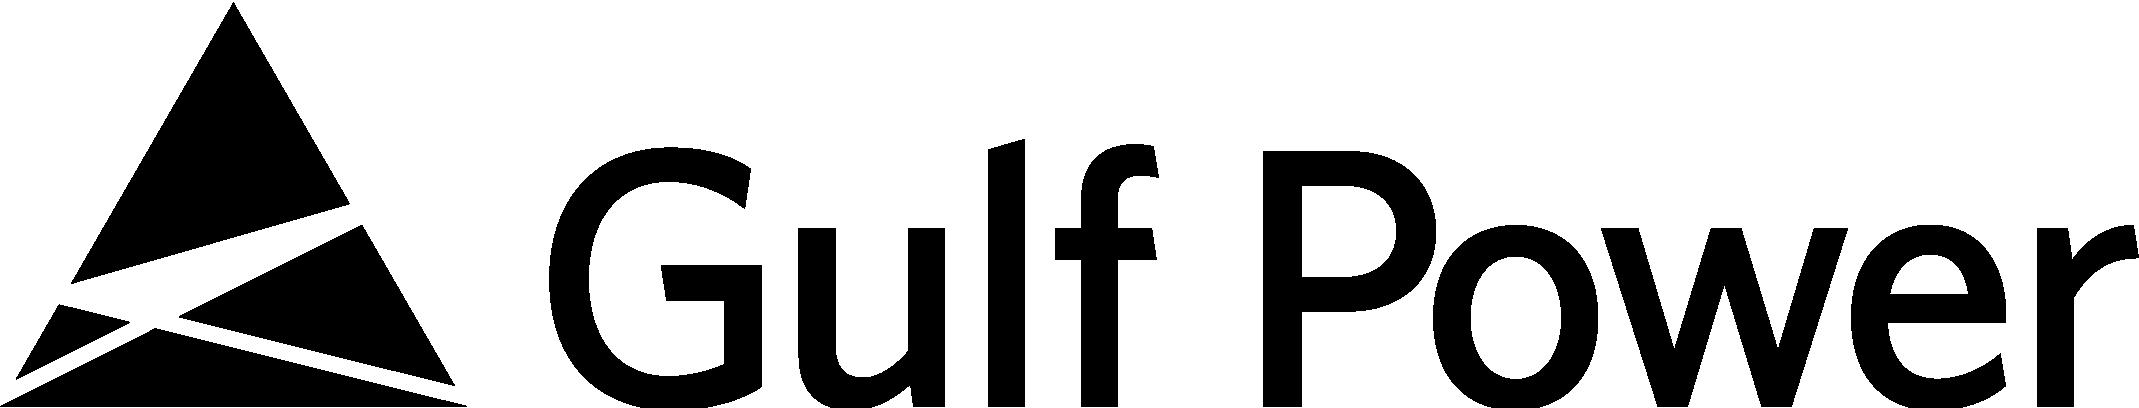 Gulf Power logo (black/horizontal)